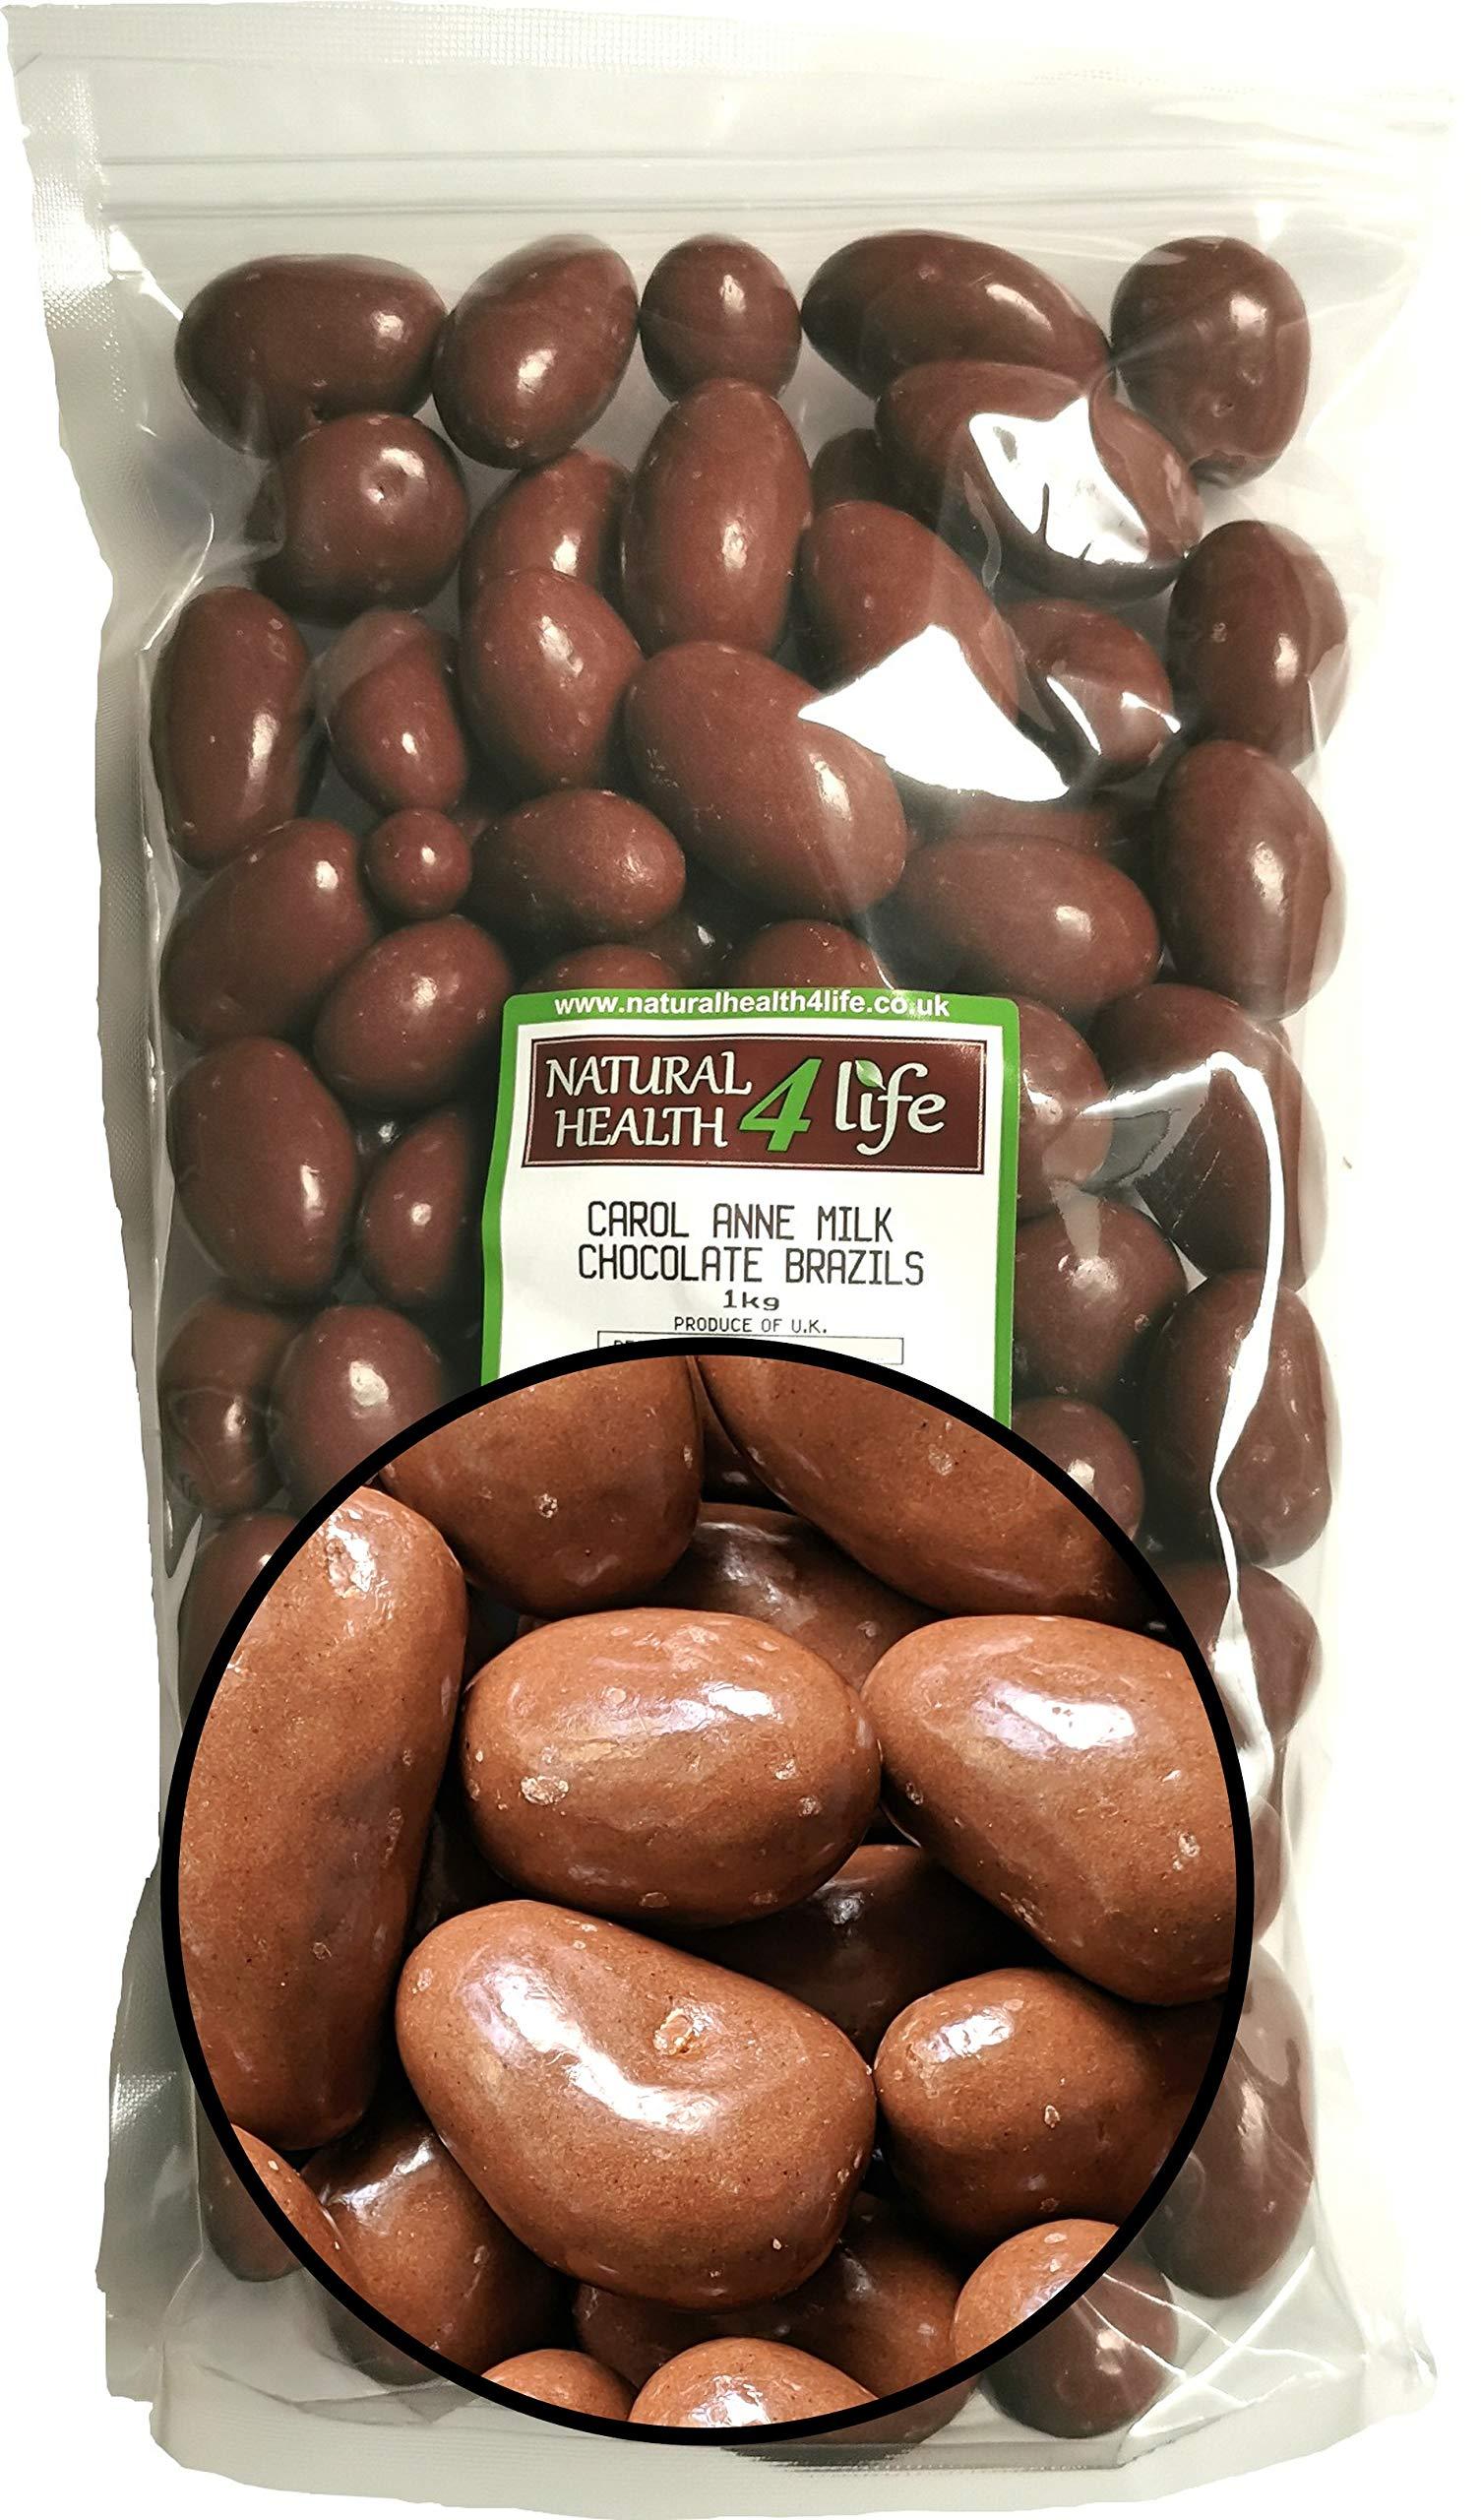 Carol Anne - Milk Chocolate Covered Brazil Nuts - 1kg